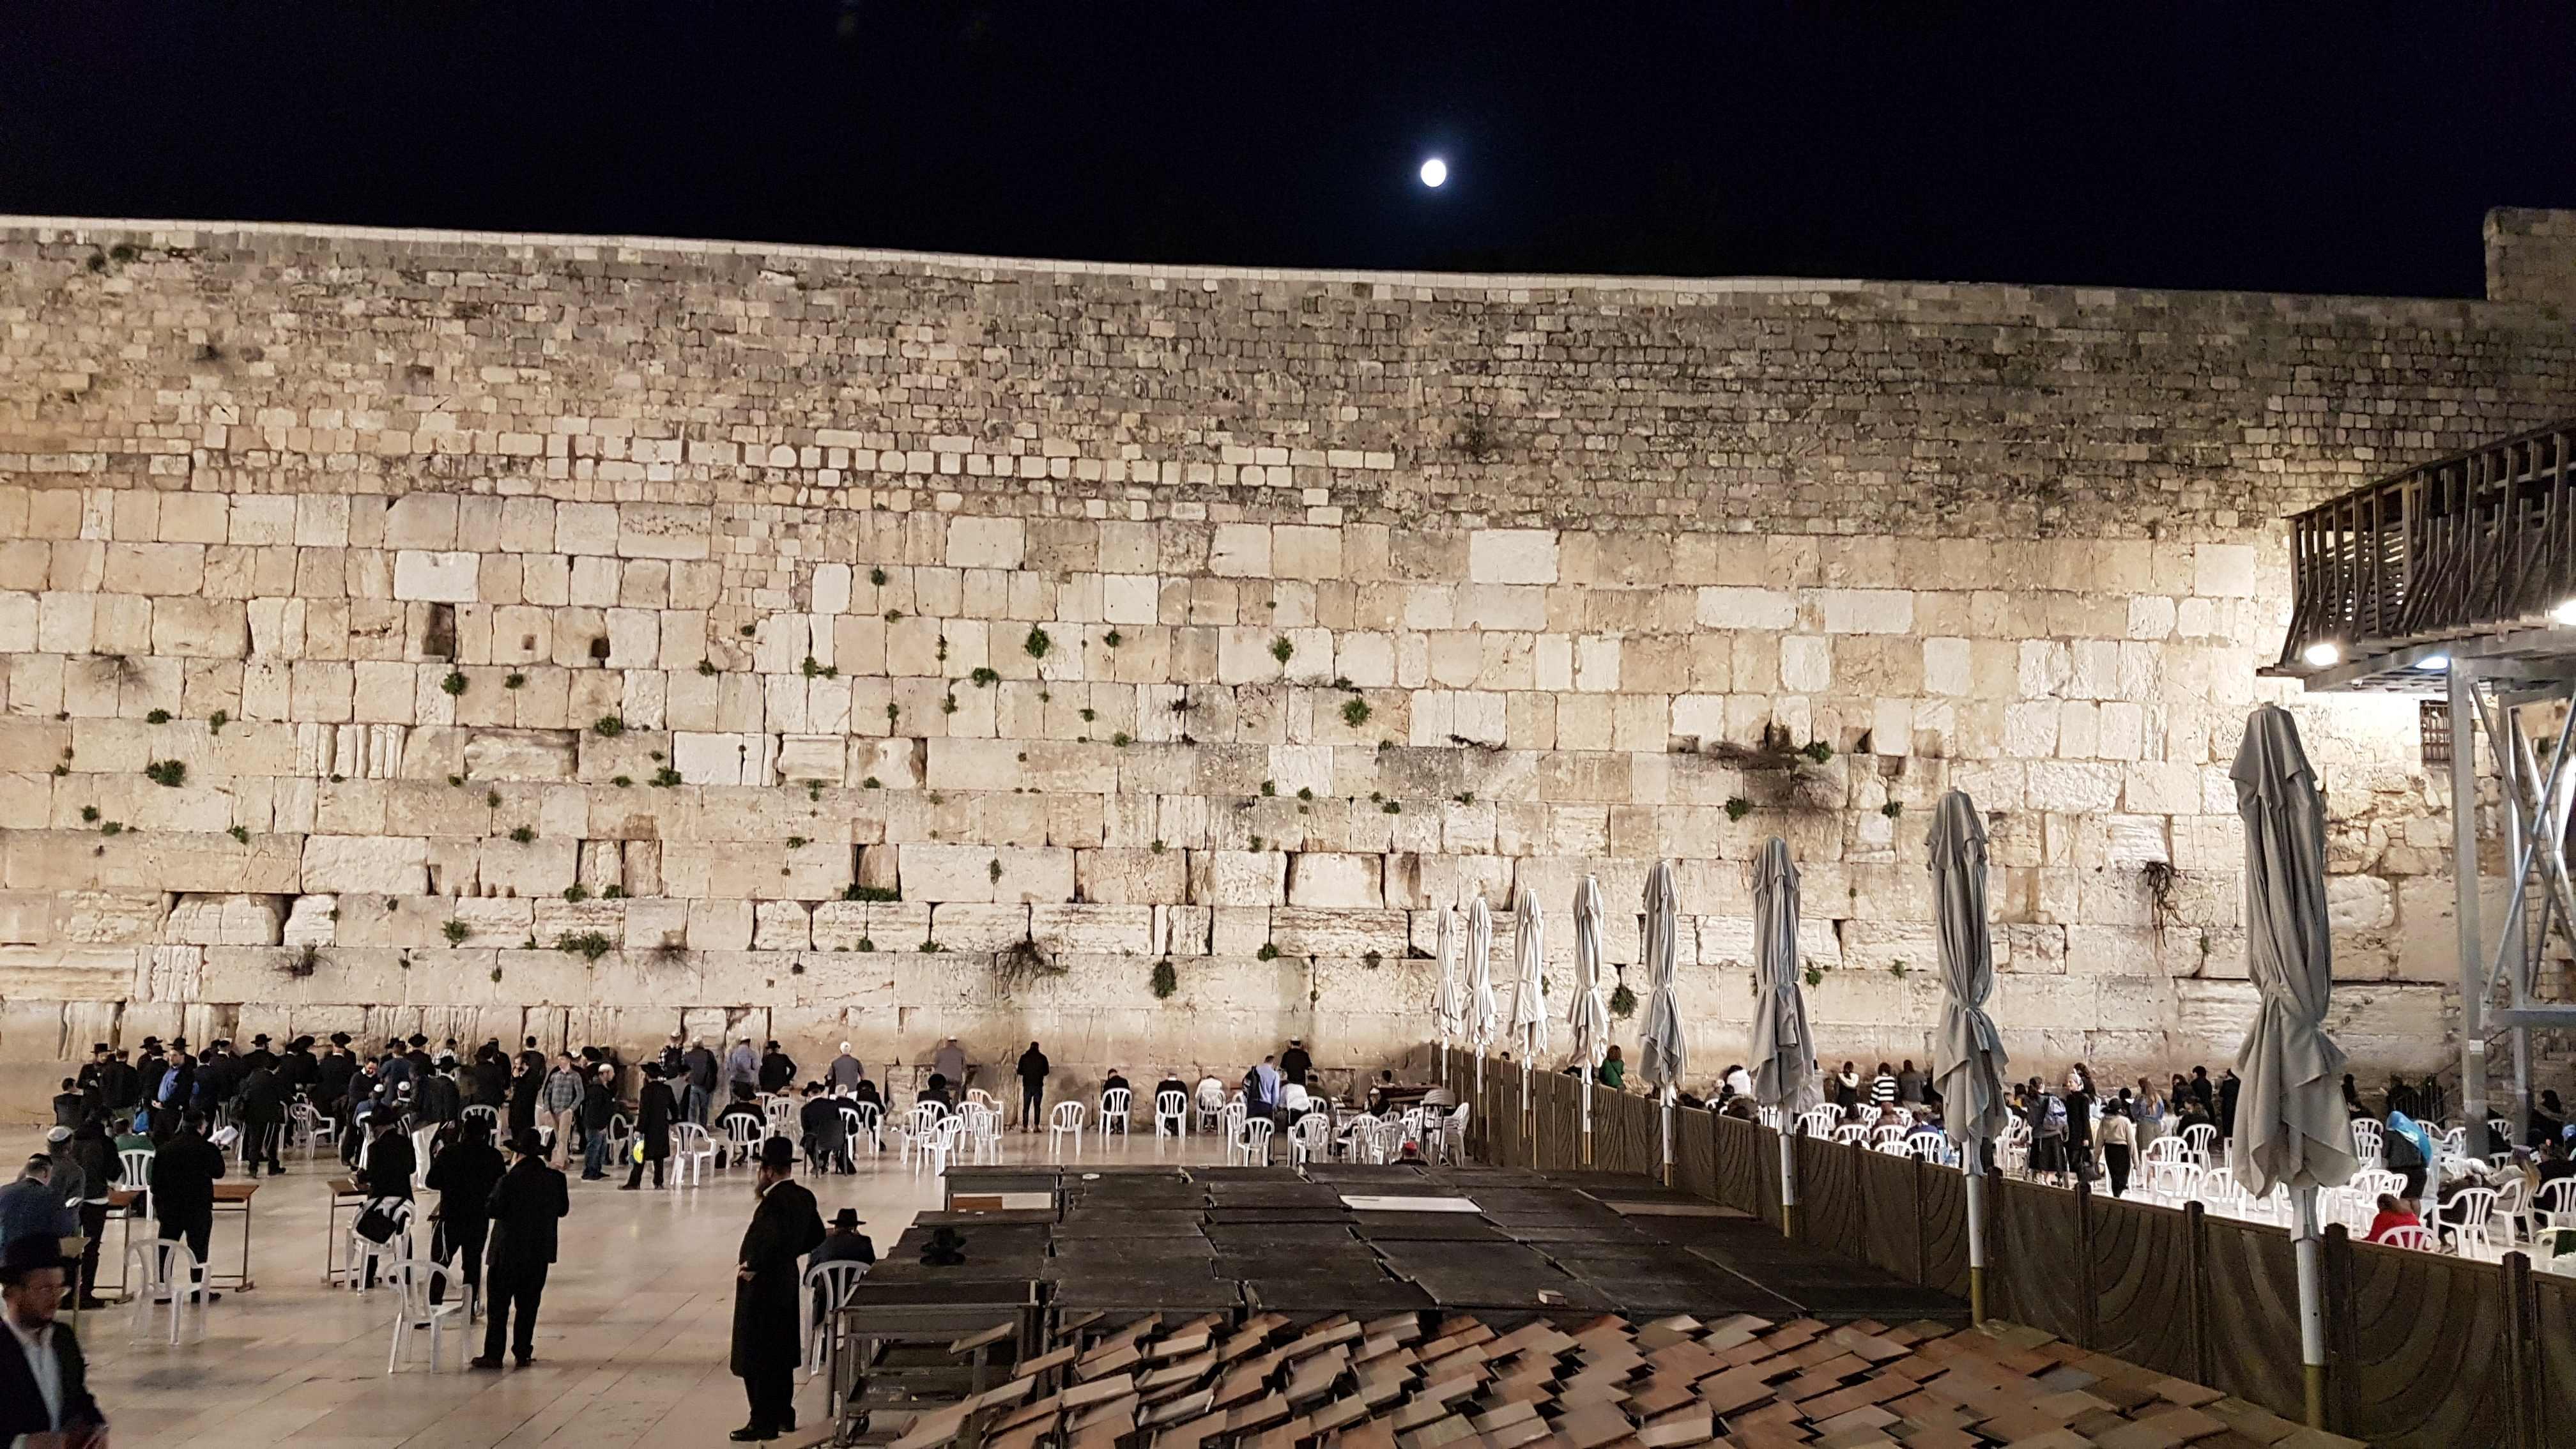 Ankunft in Jerusalem am Abend